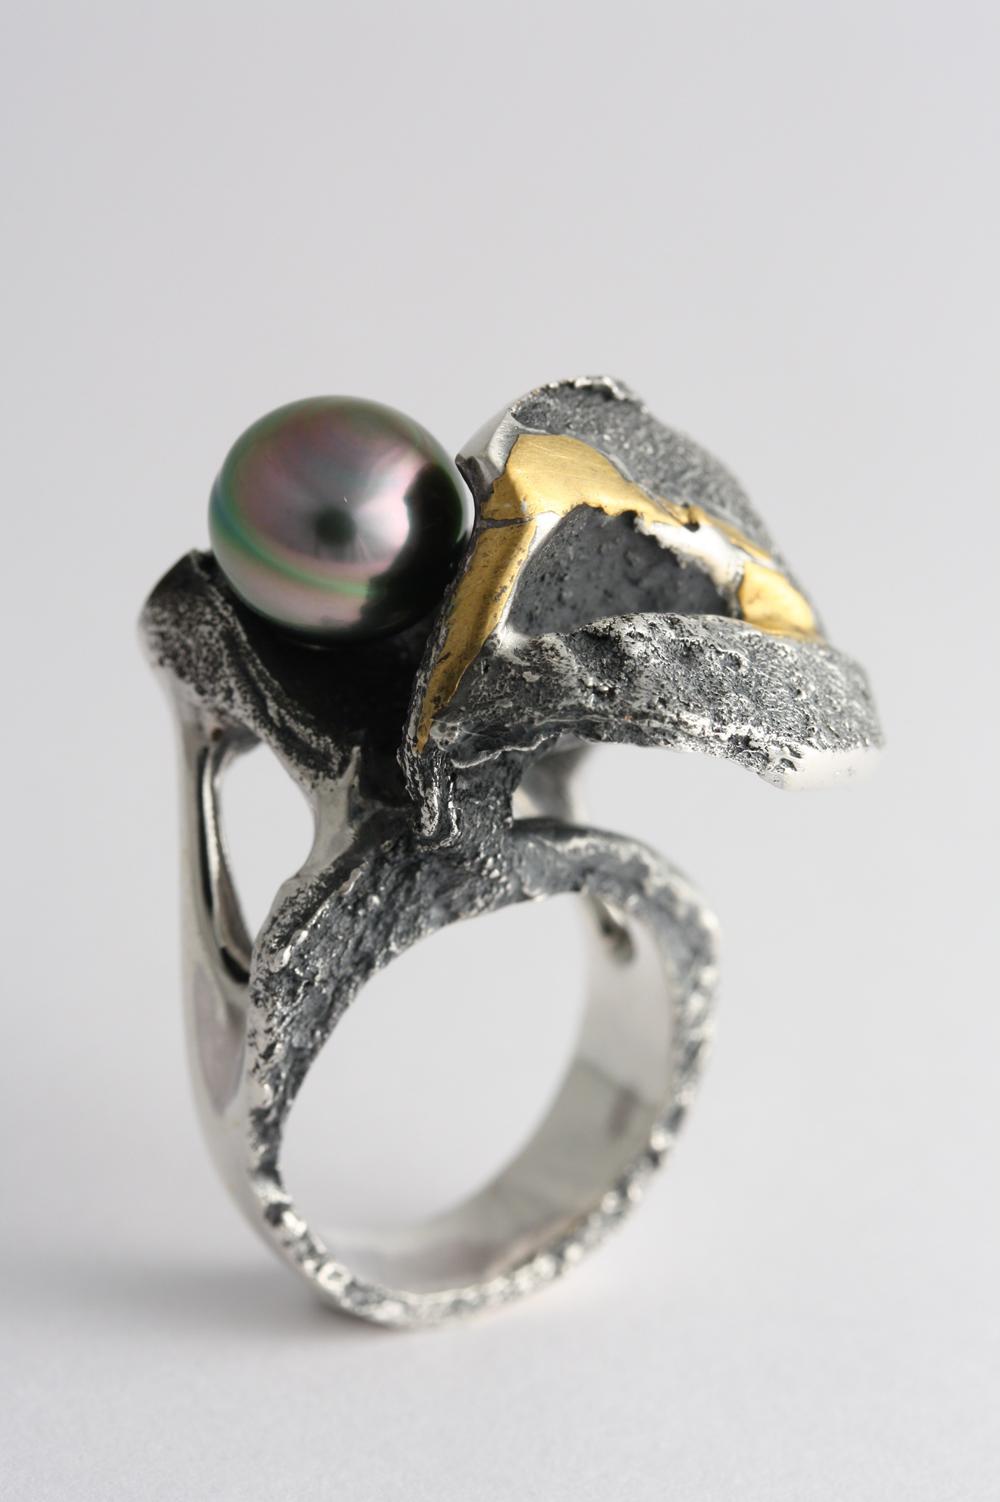 bague 23019B, arg.ster., or 24kt., kum-boo, 1 perle de Tahiti, cire perdue, années 2000, photo-Michel Gauvin